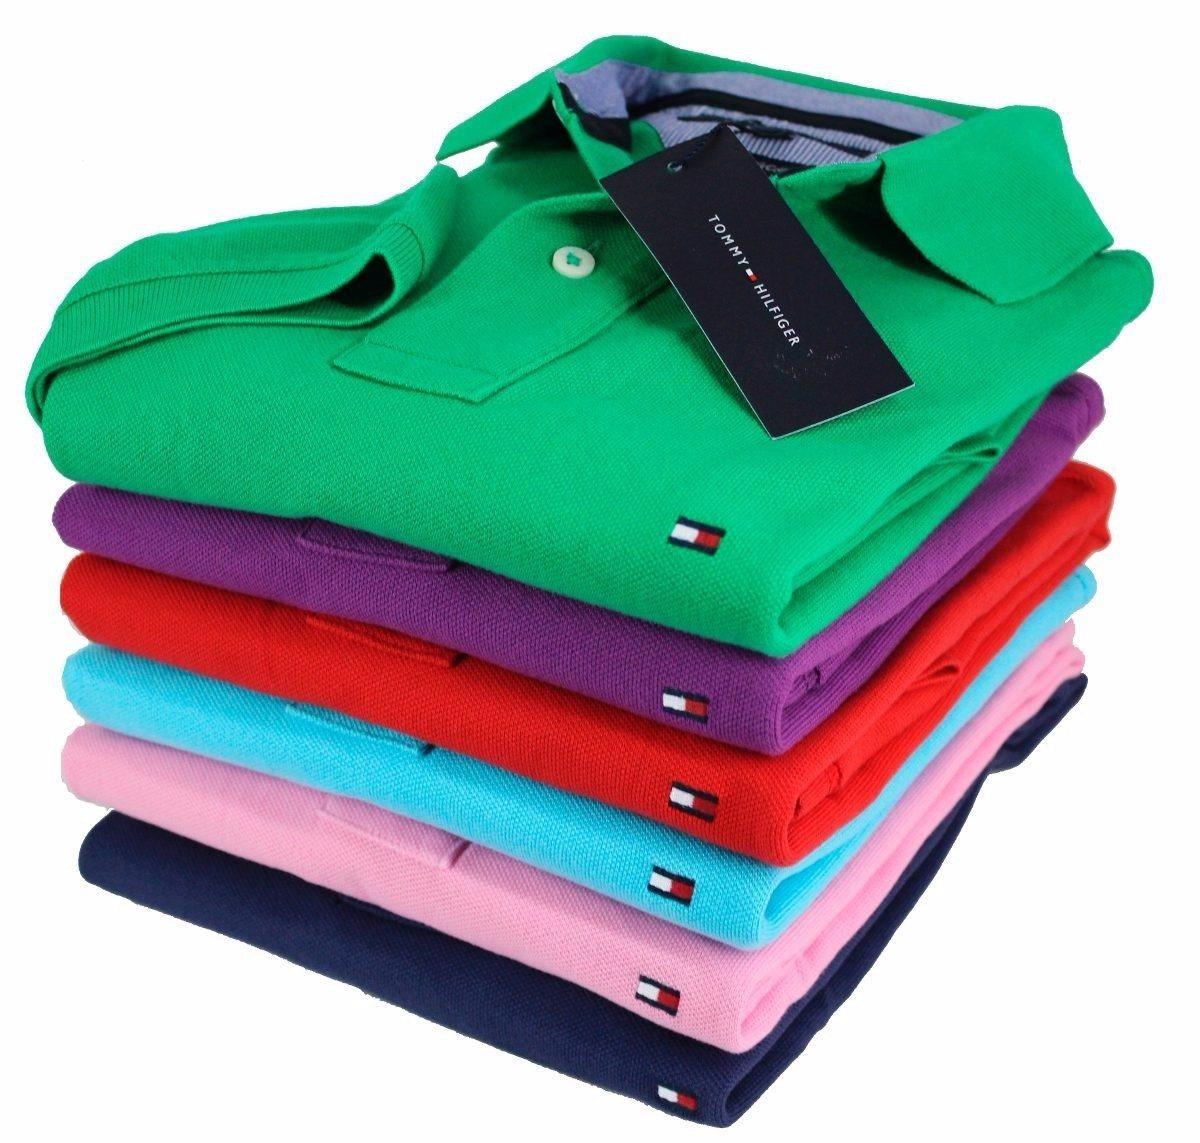 camisa polo masculina grandes marcas revenda oferta. Carregando zoom. 7b18f3cd855ea